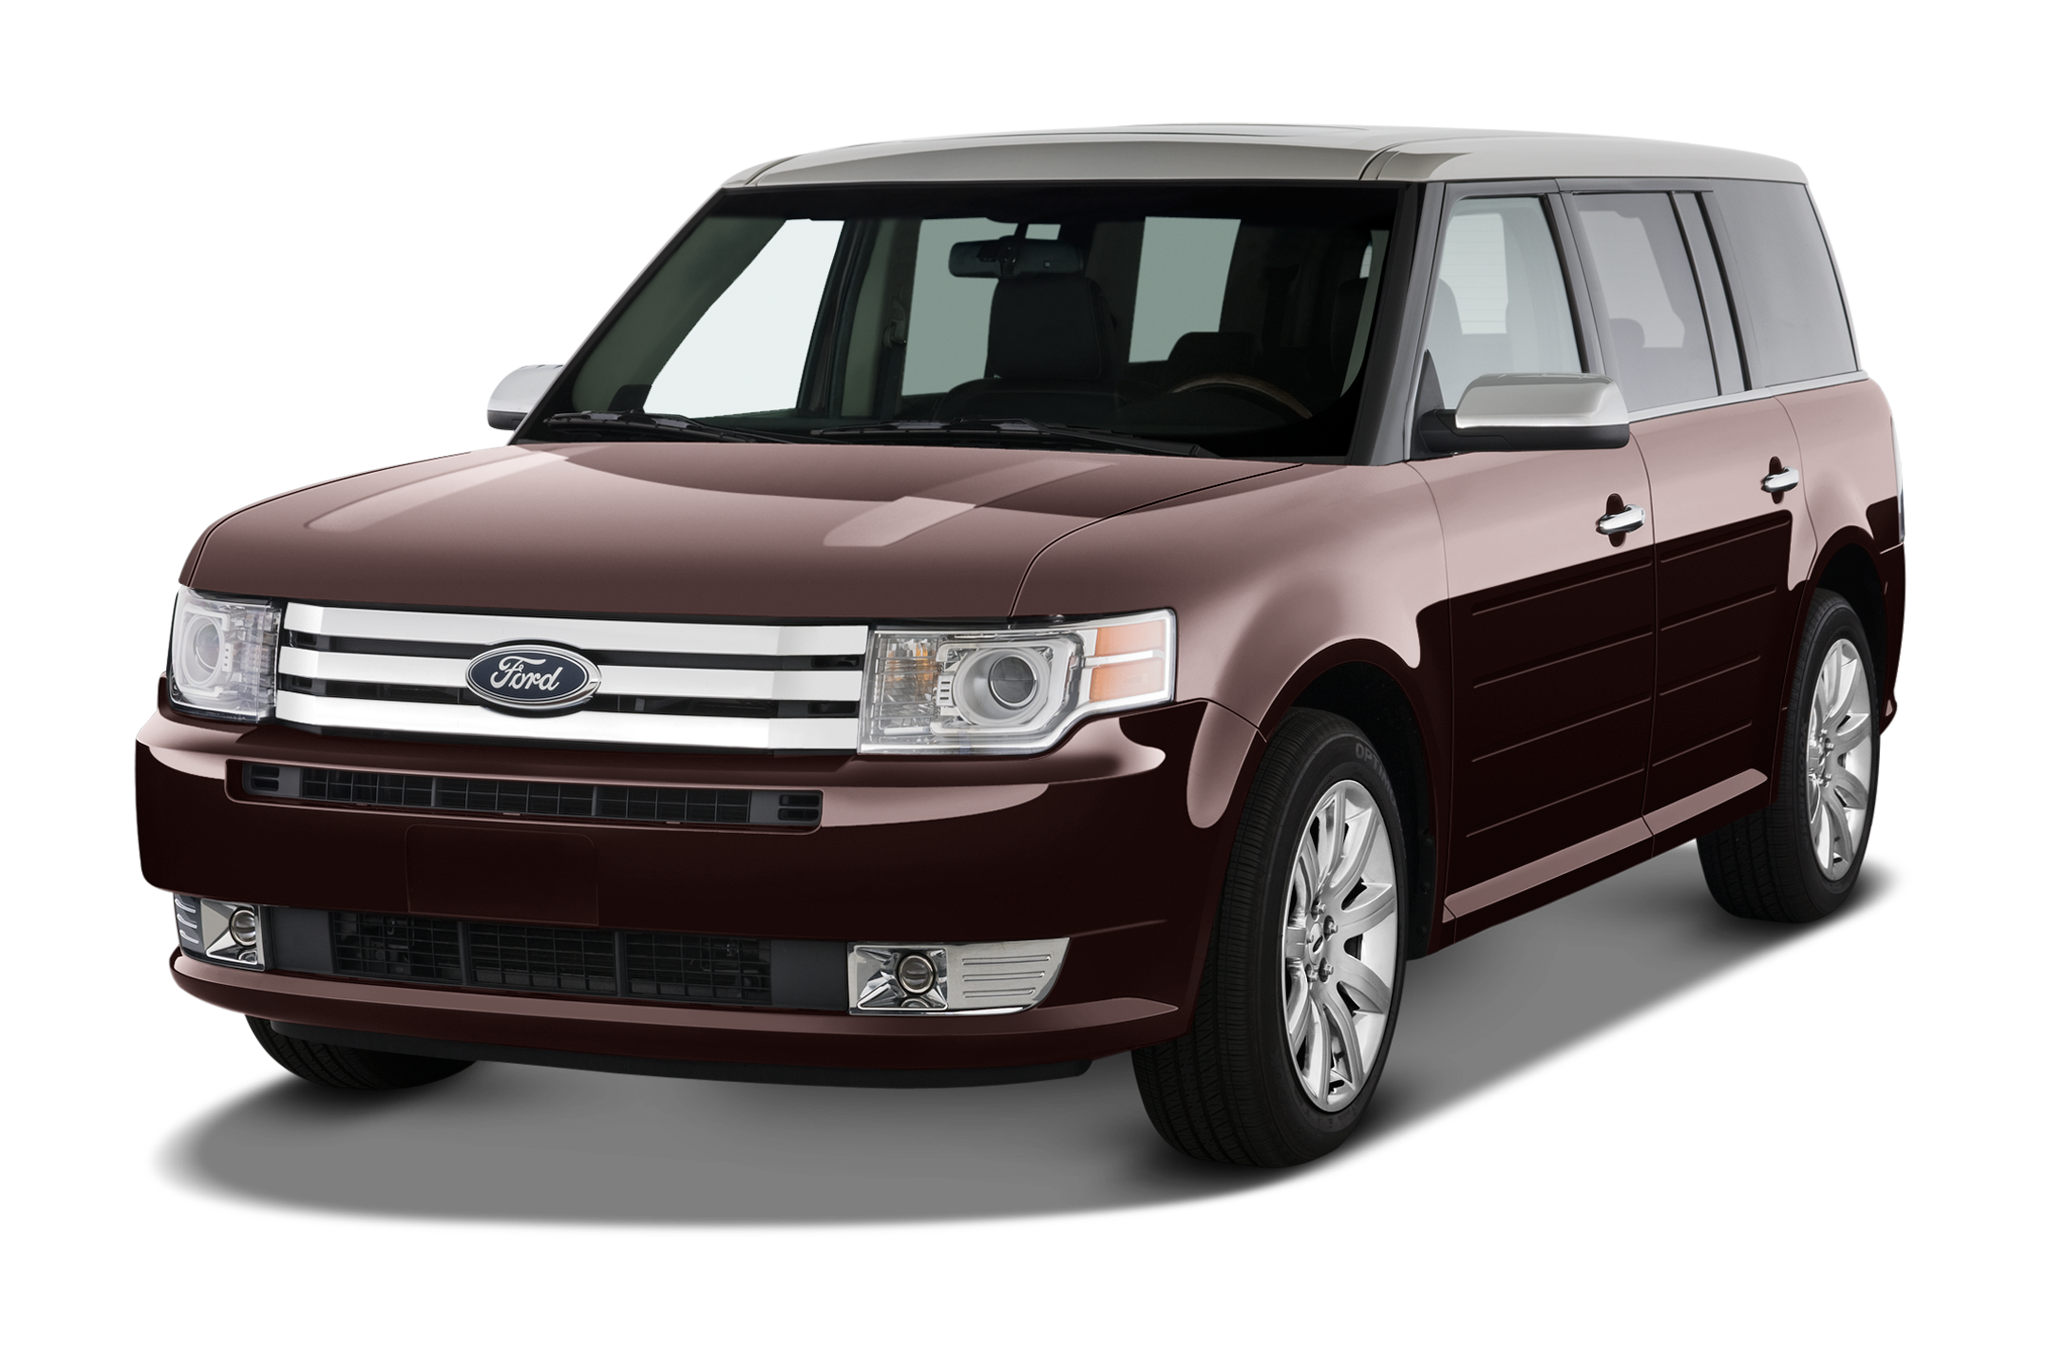 2013 Ford Flex Gains Standard Sync System On All Models